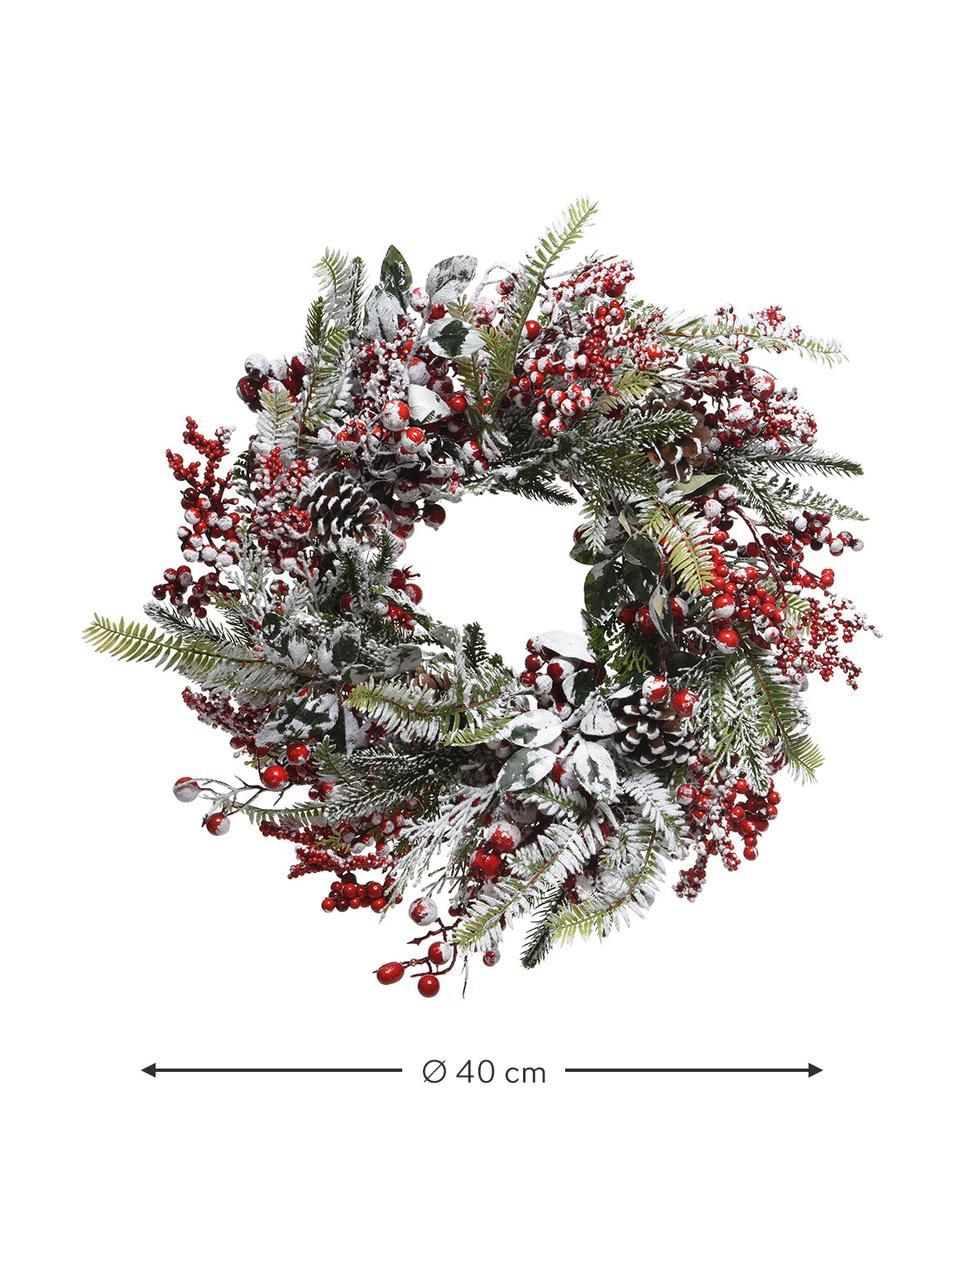 Ghirlanda di Natale Patrizia, Ø 40 cm, Materiale sintetico, Verde, rosso, bianco, Ø 40 x Alt. 15 cm